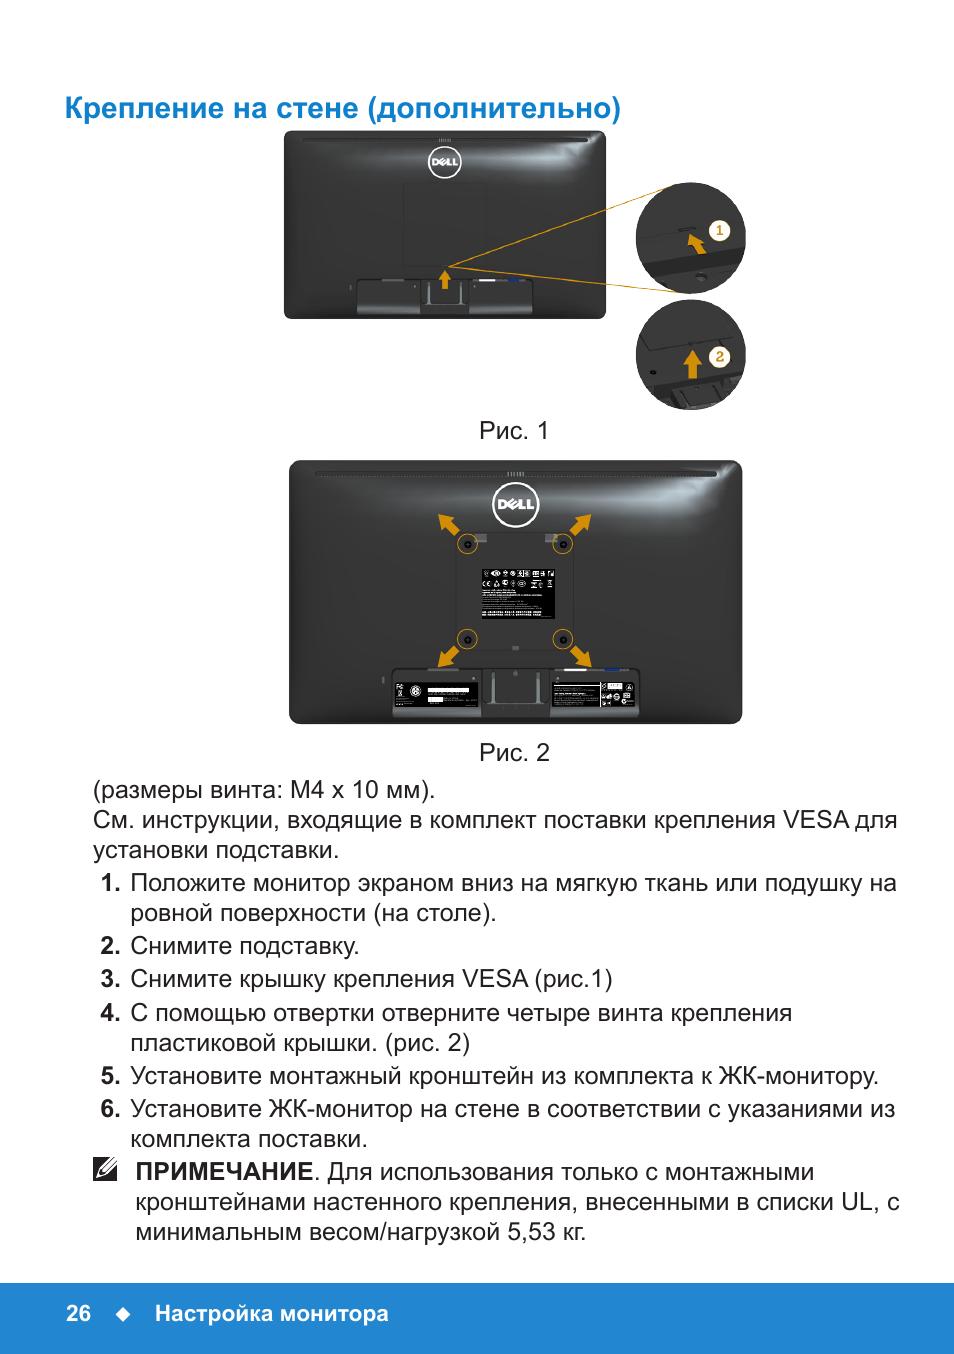 Инструкция по эксплуатации монитора